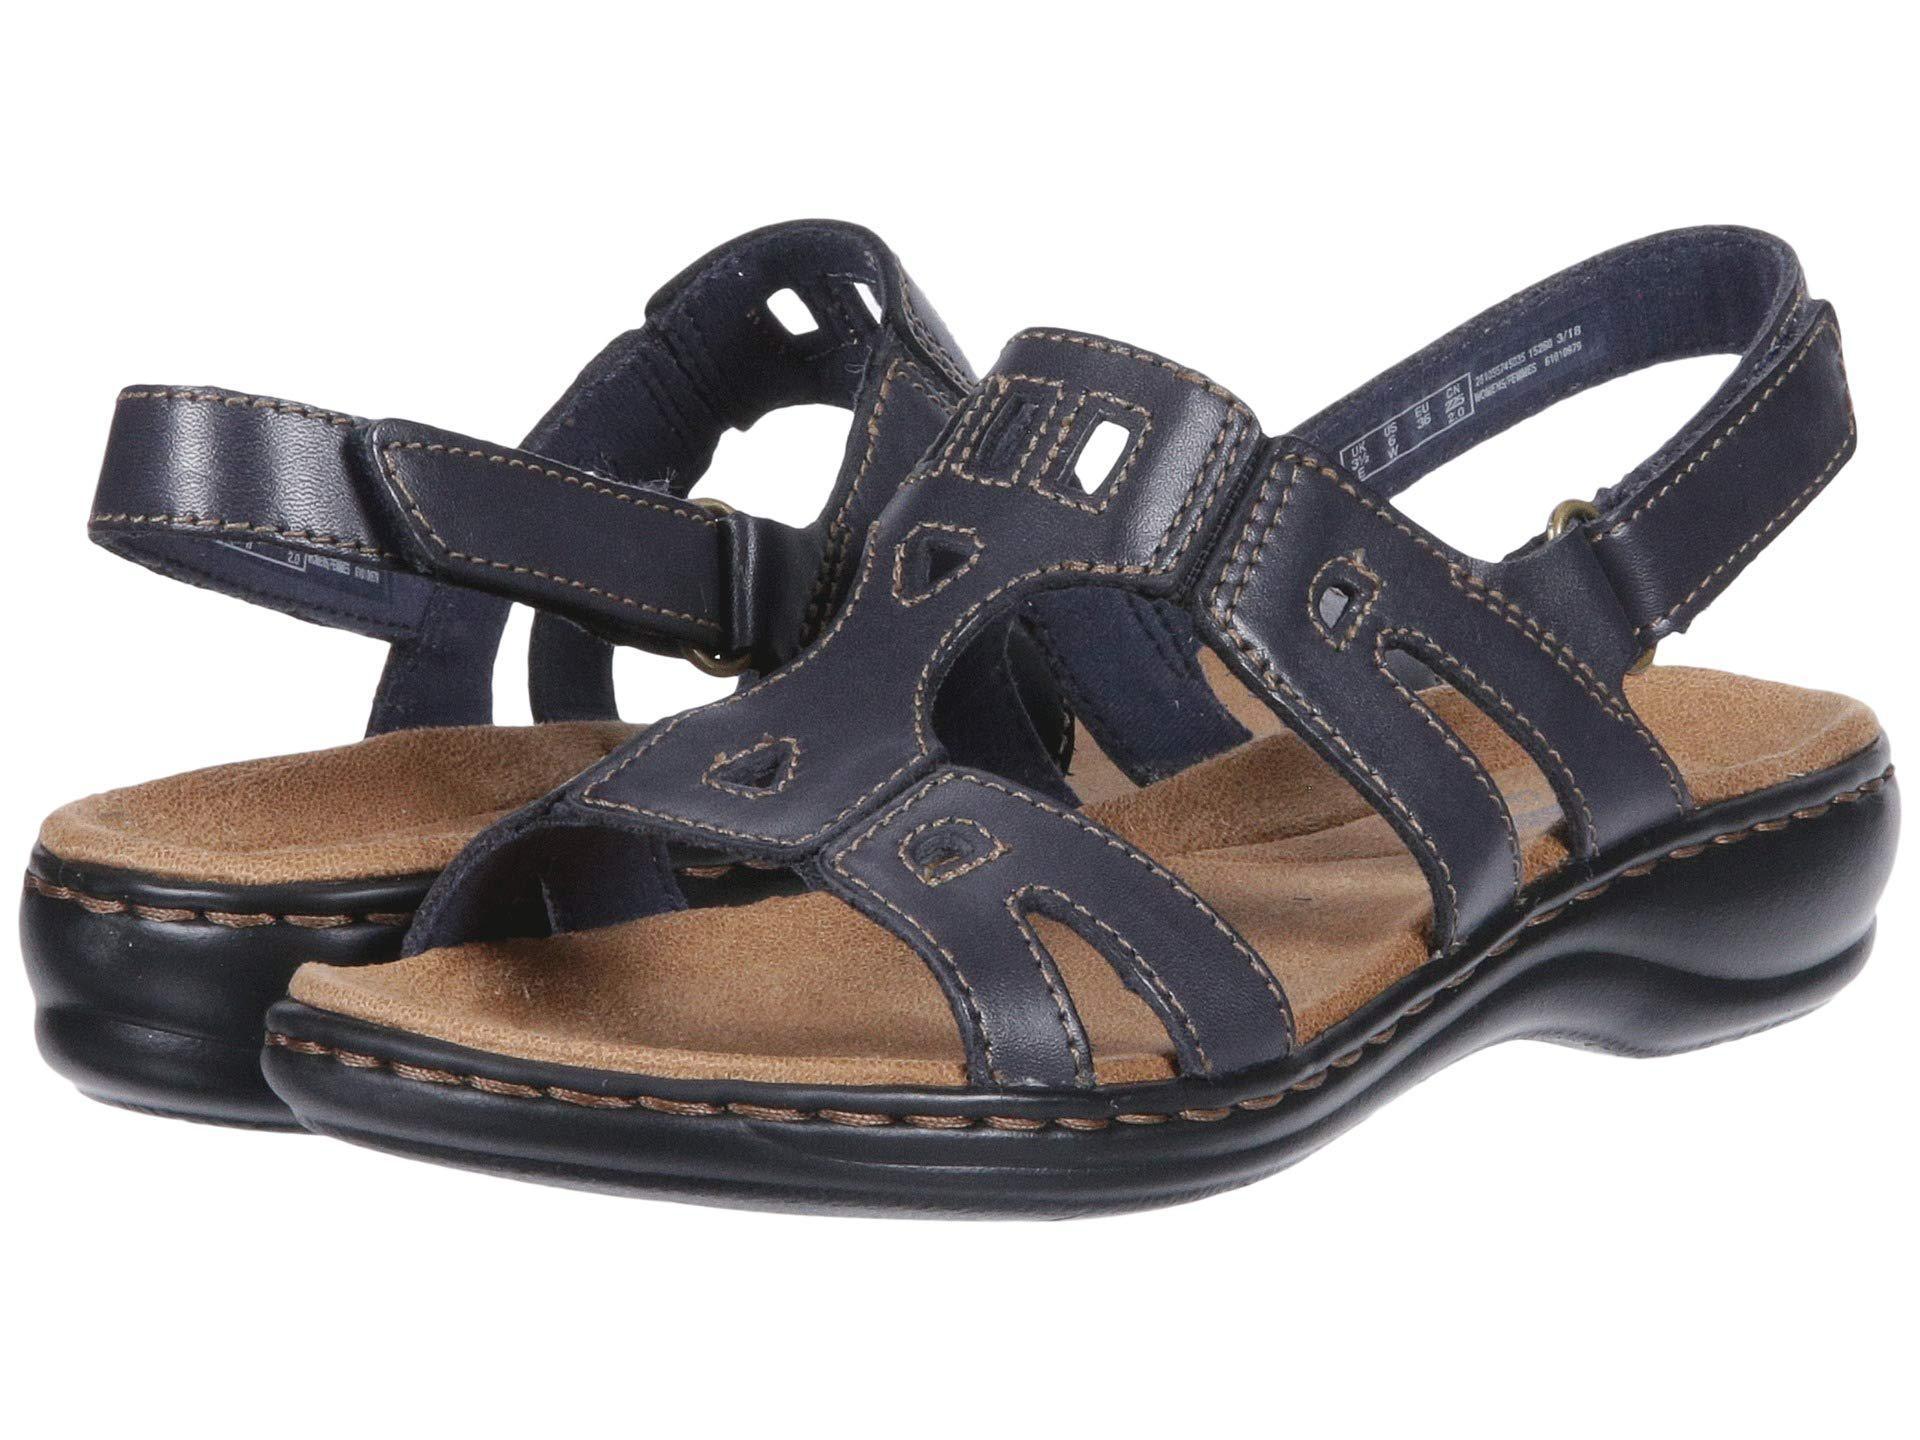 e8b6527d771e Lyst - Clarks Leisa Annual (dark Tan Leather) Women s Sandals in ...